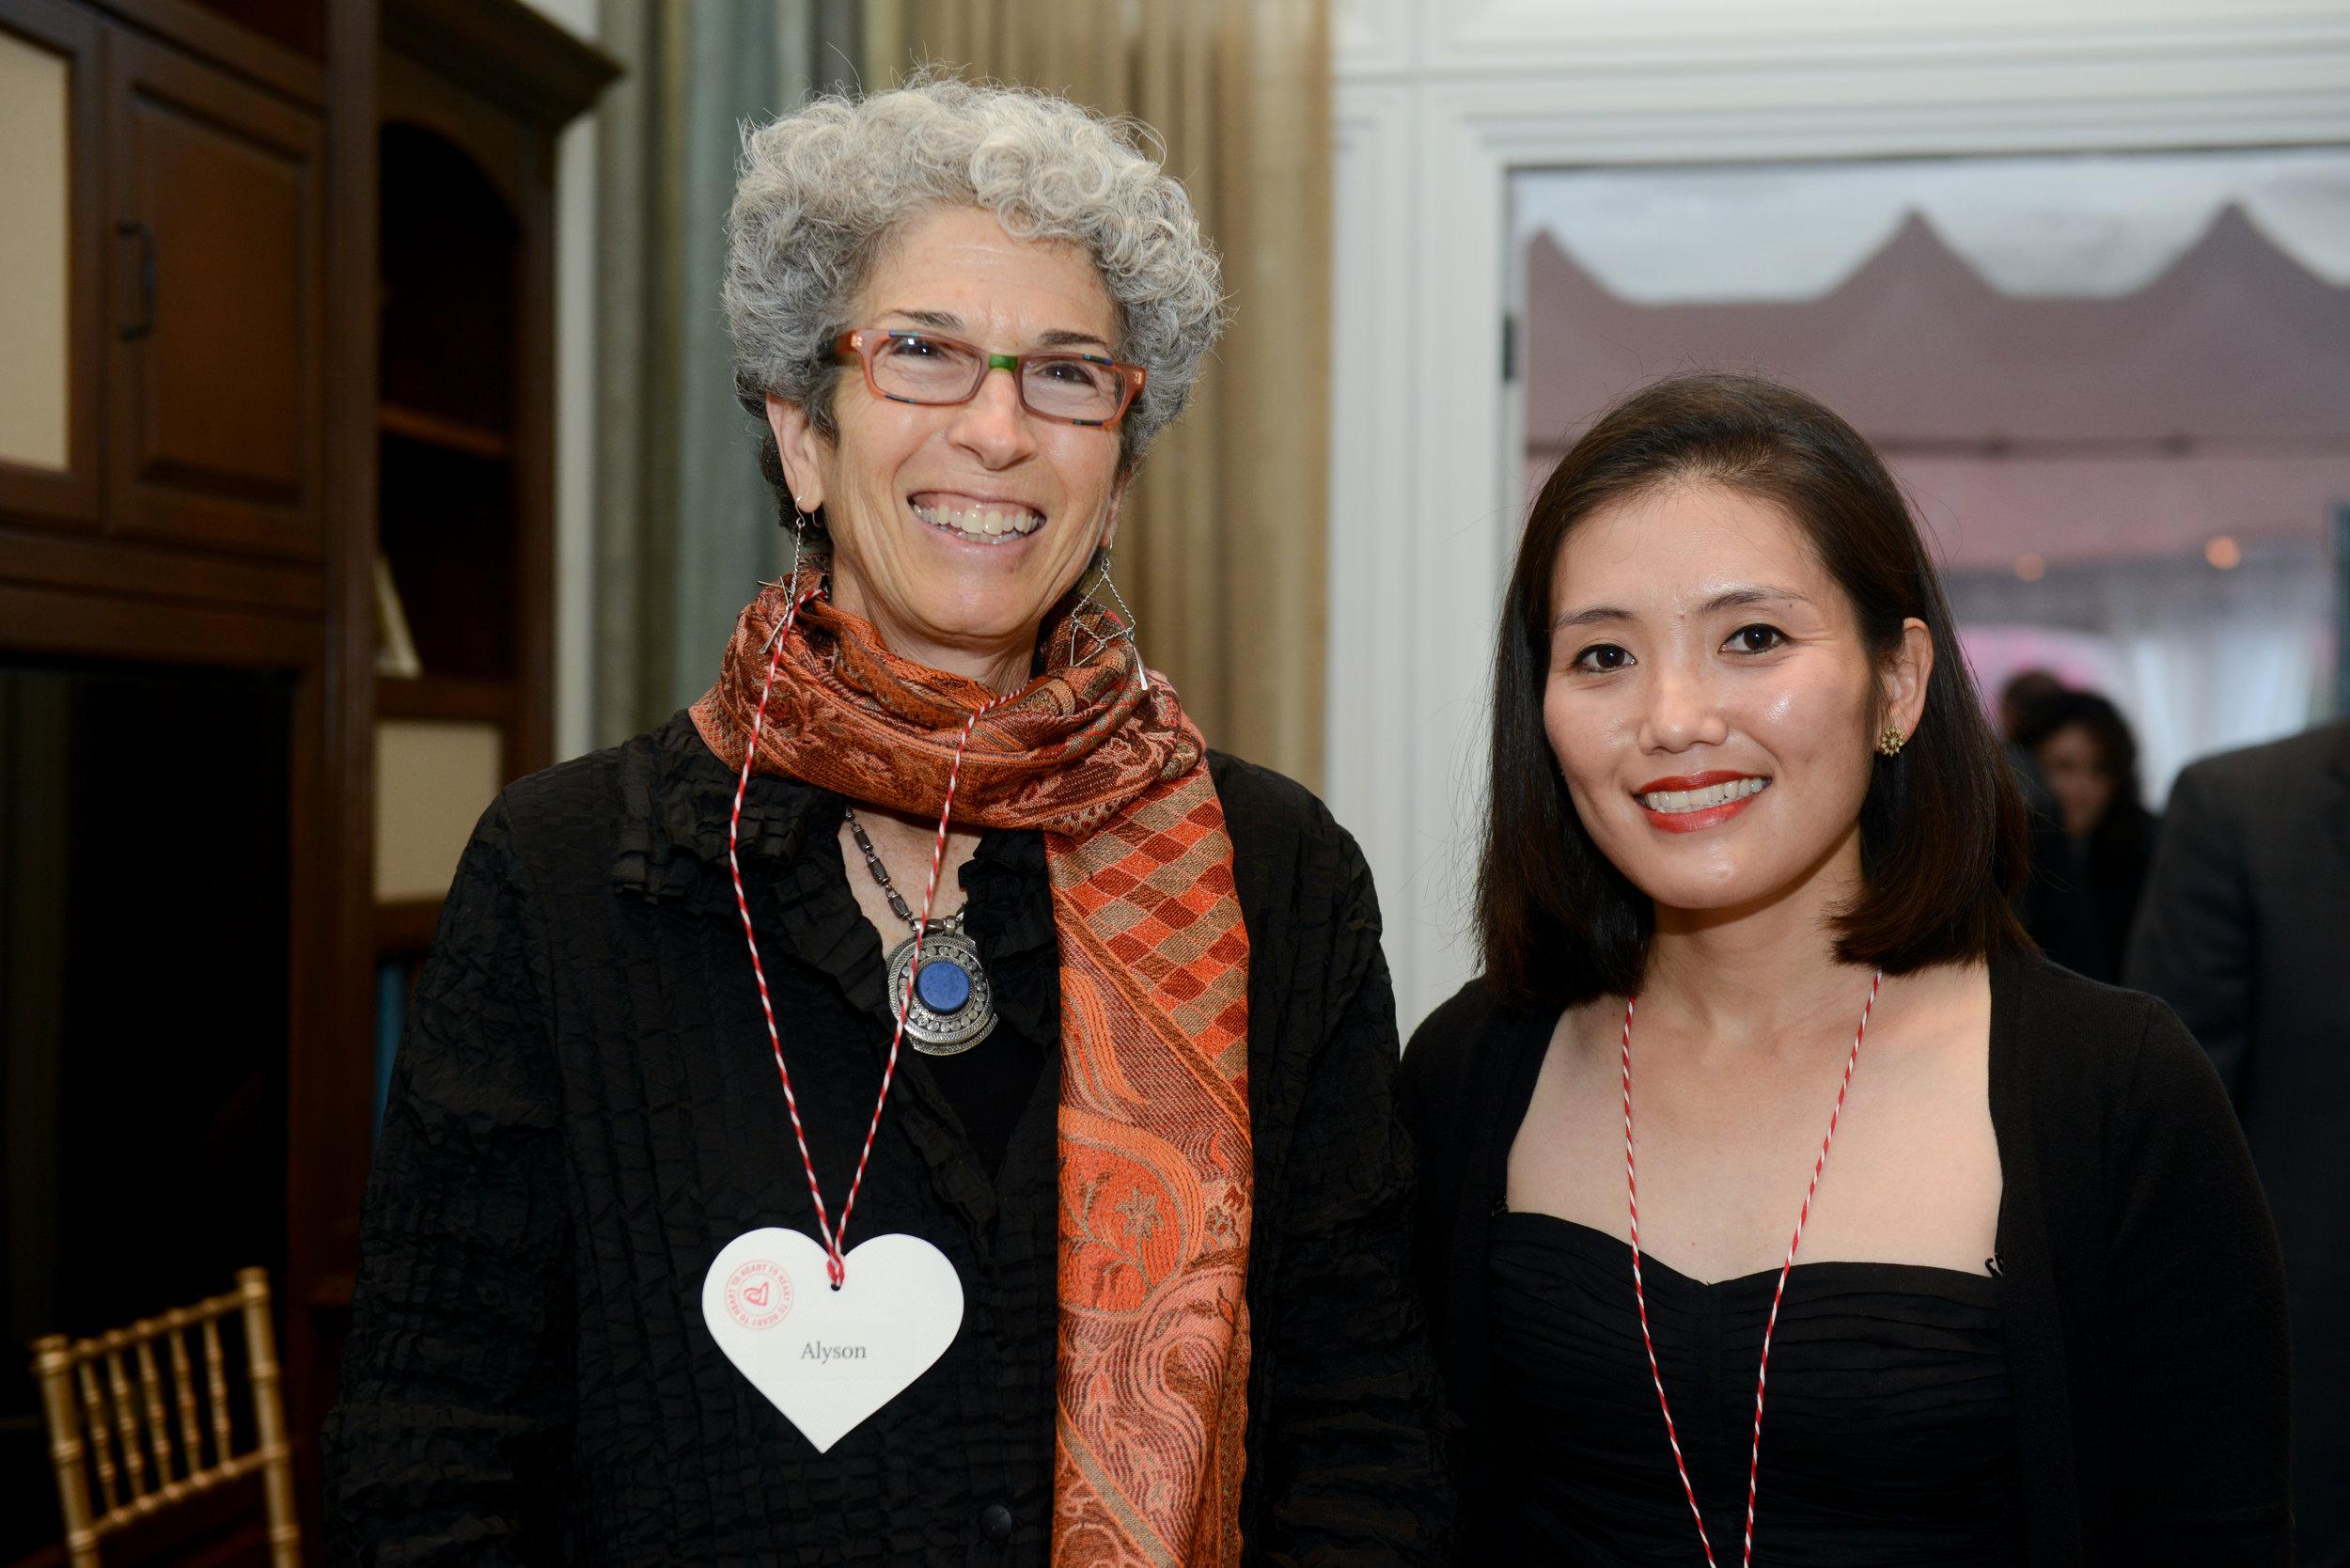 Alyson Kuhn and Sheri Kuniyuki